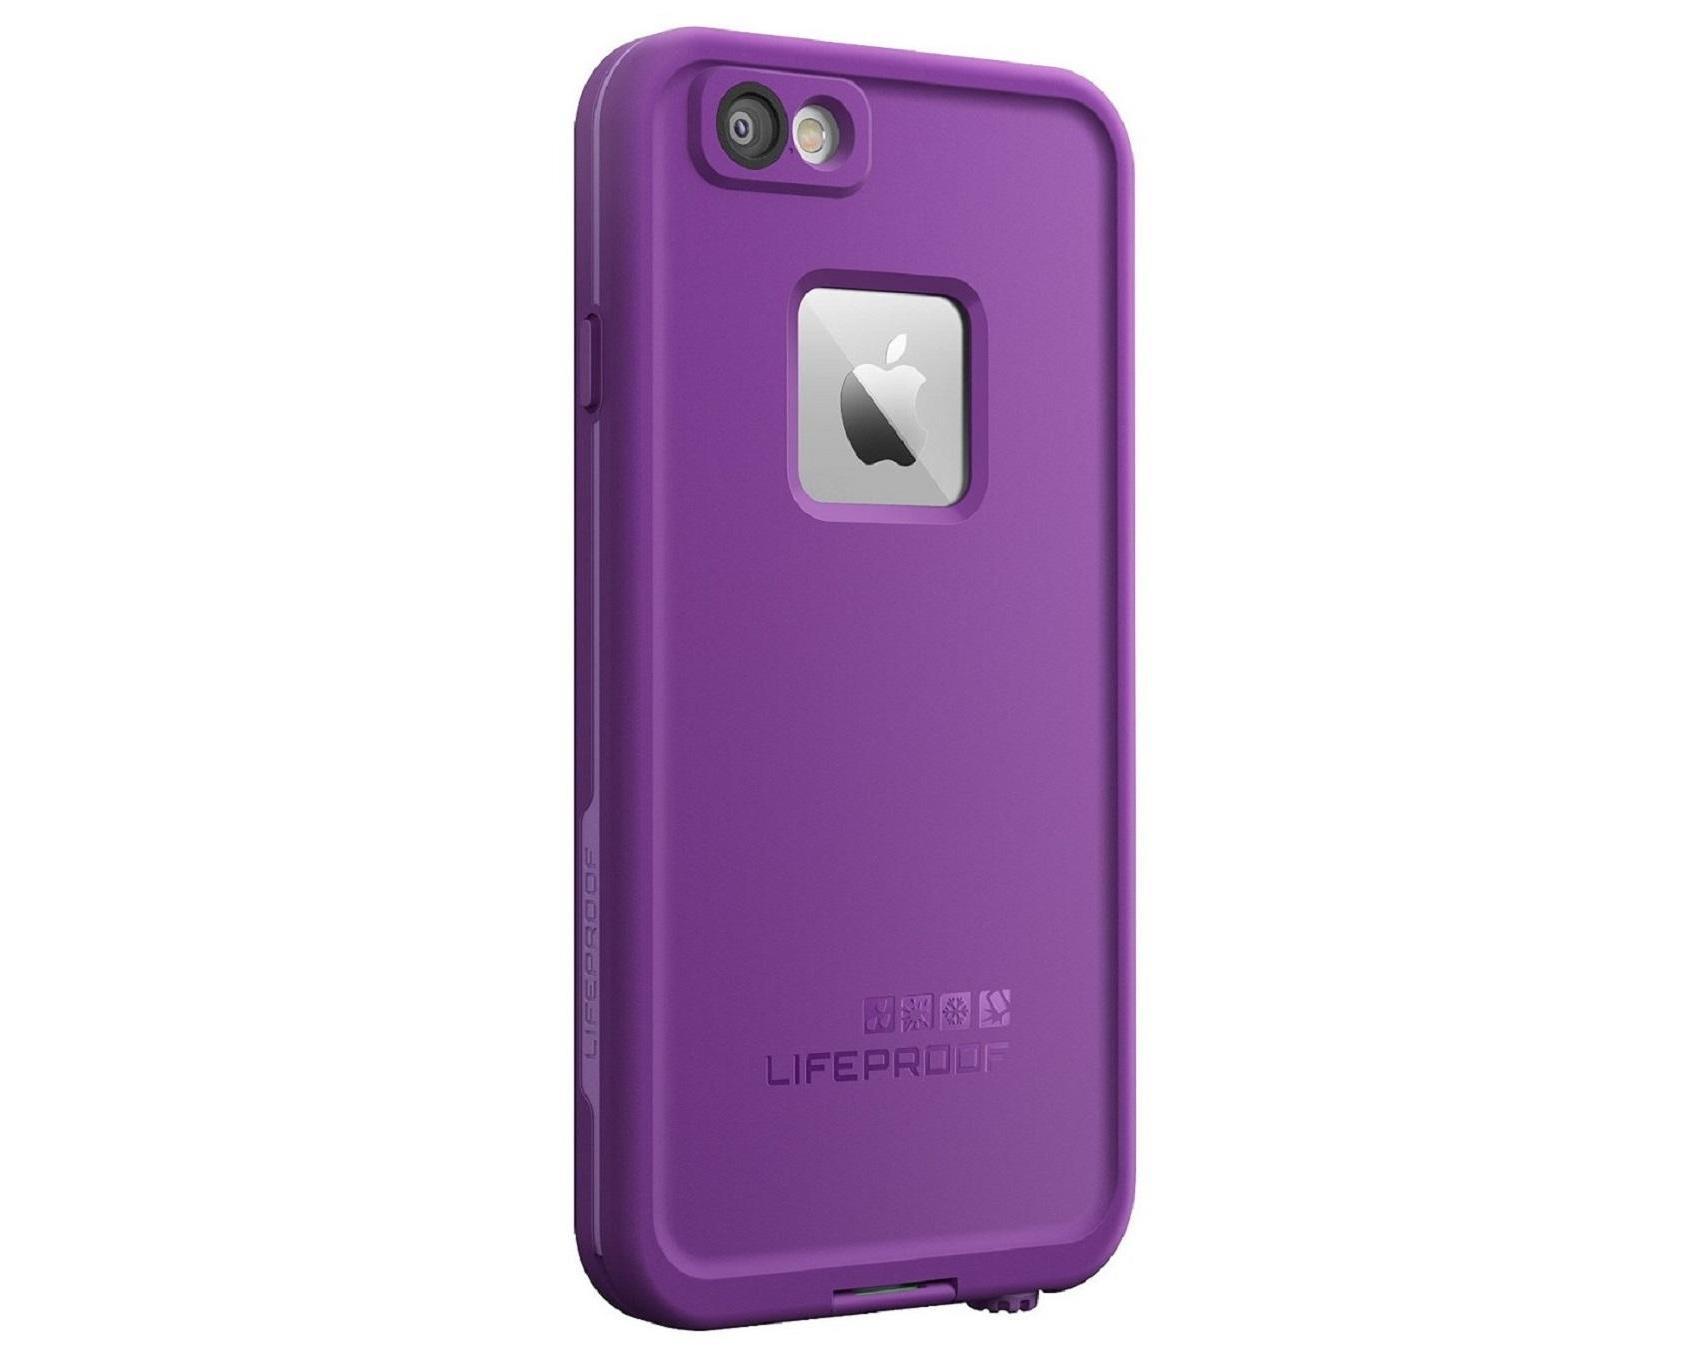 iPhone 6 Lifeproof fre case - Walmart.com c56e0881fae9